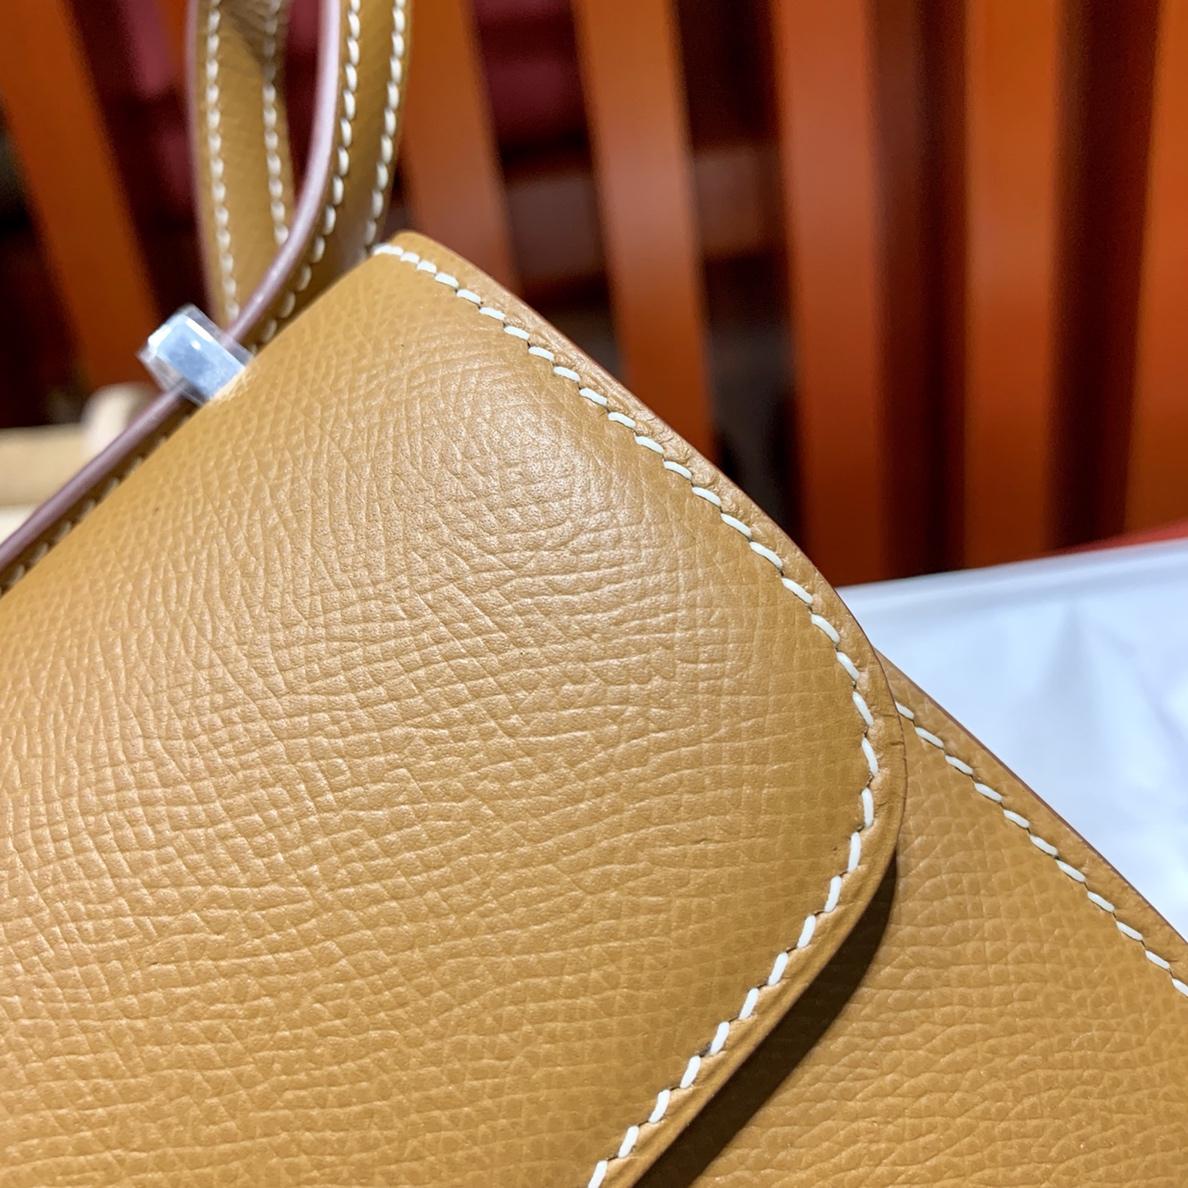 爱马仕康斯坦包价格 Hermes Mini Constance14cm 土黄色Epsom皮 金扣